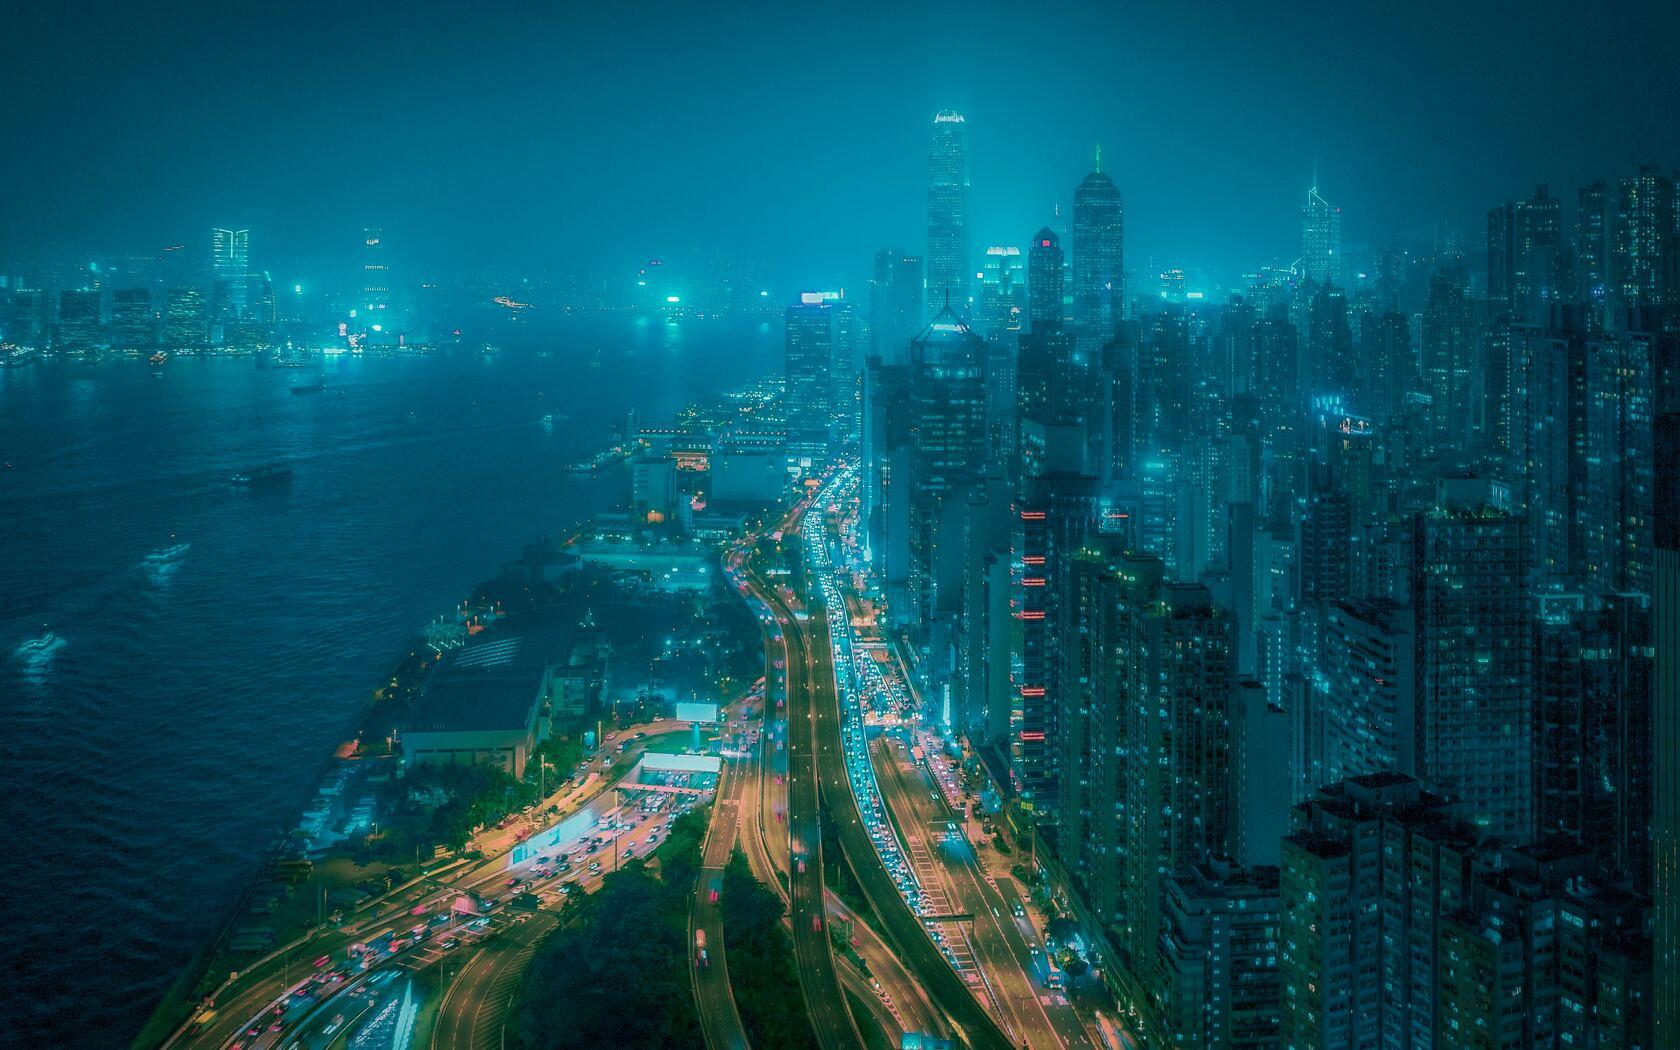 aerial-view-downtown-lights-5k-tg.jpg